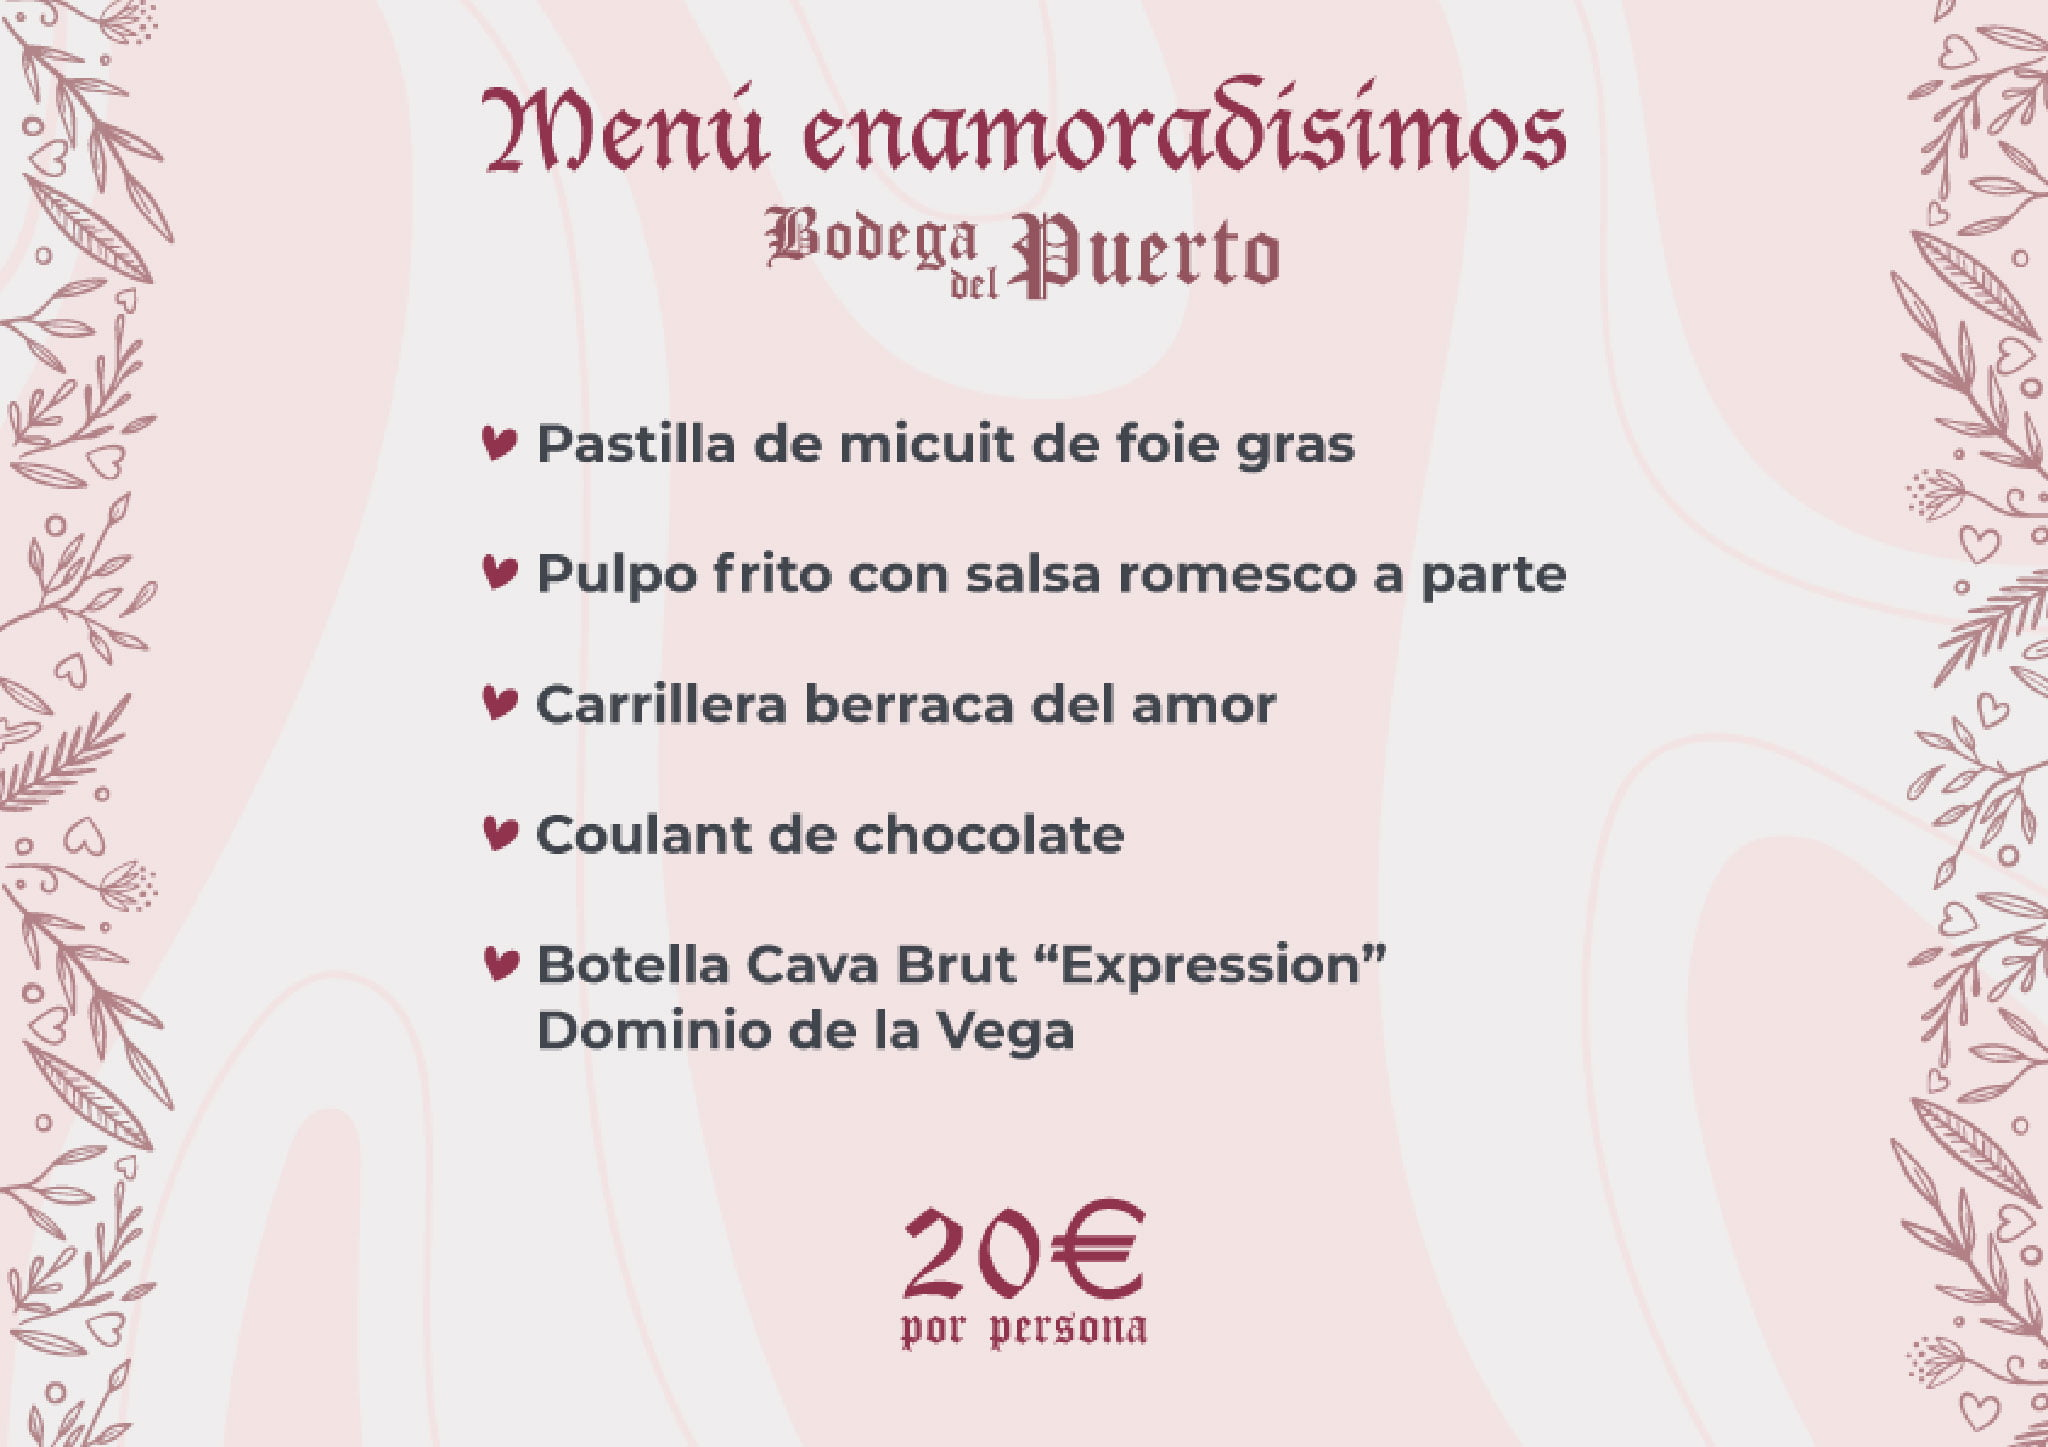 Valentine's menu in Dénia - Bodega del Puerto